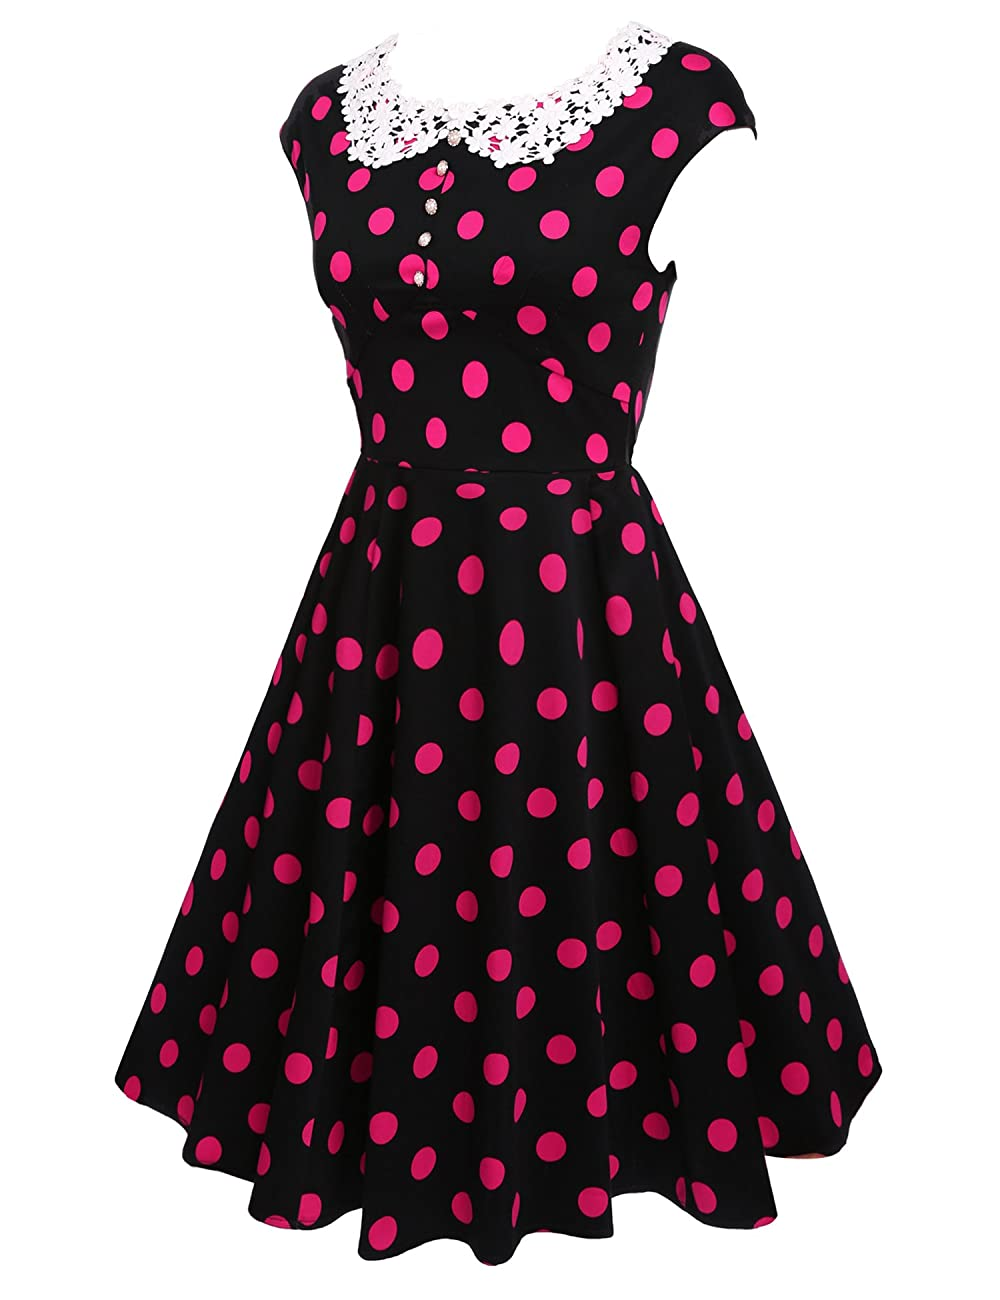 ACEVOG Women's Classy Vintage Audrey Hepburn Style 1940's Rockabilly Evening Dress 2